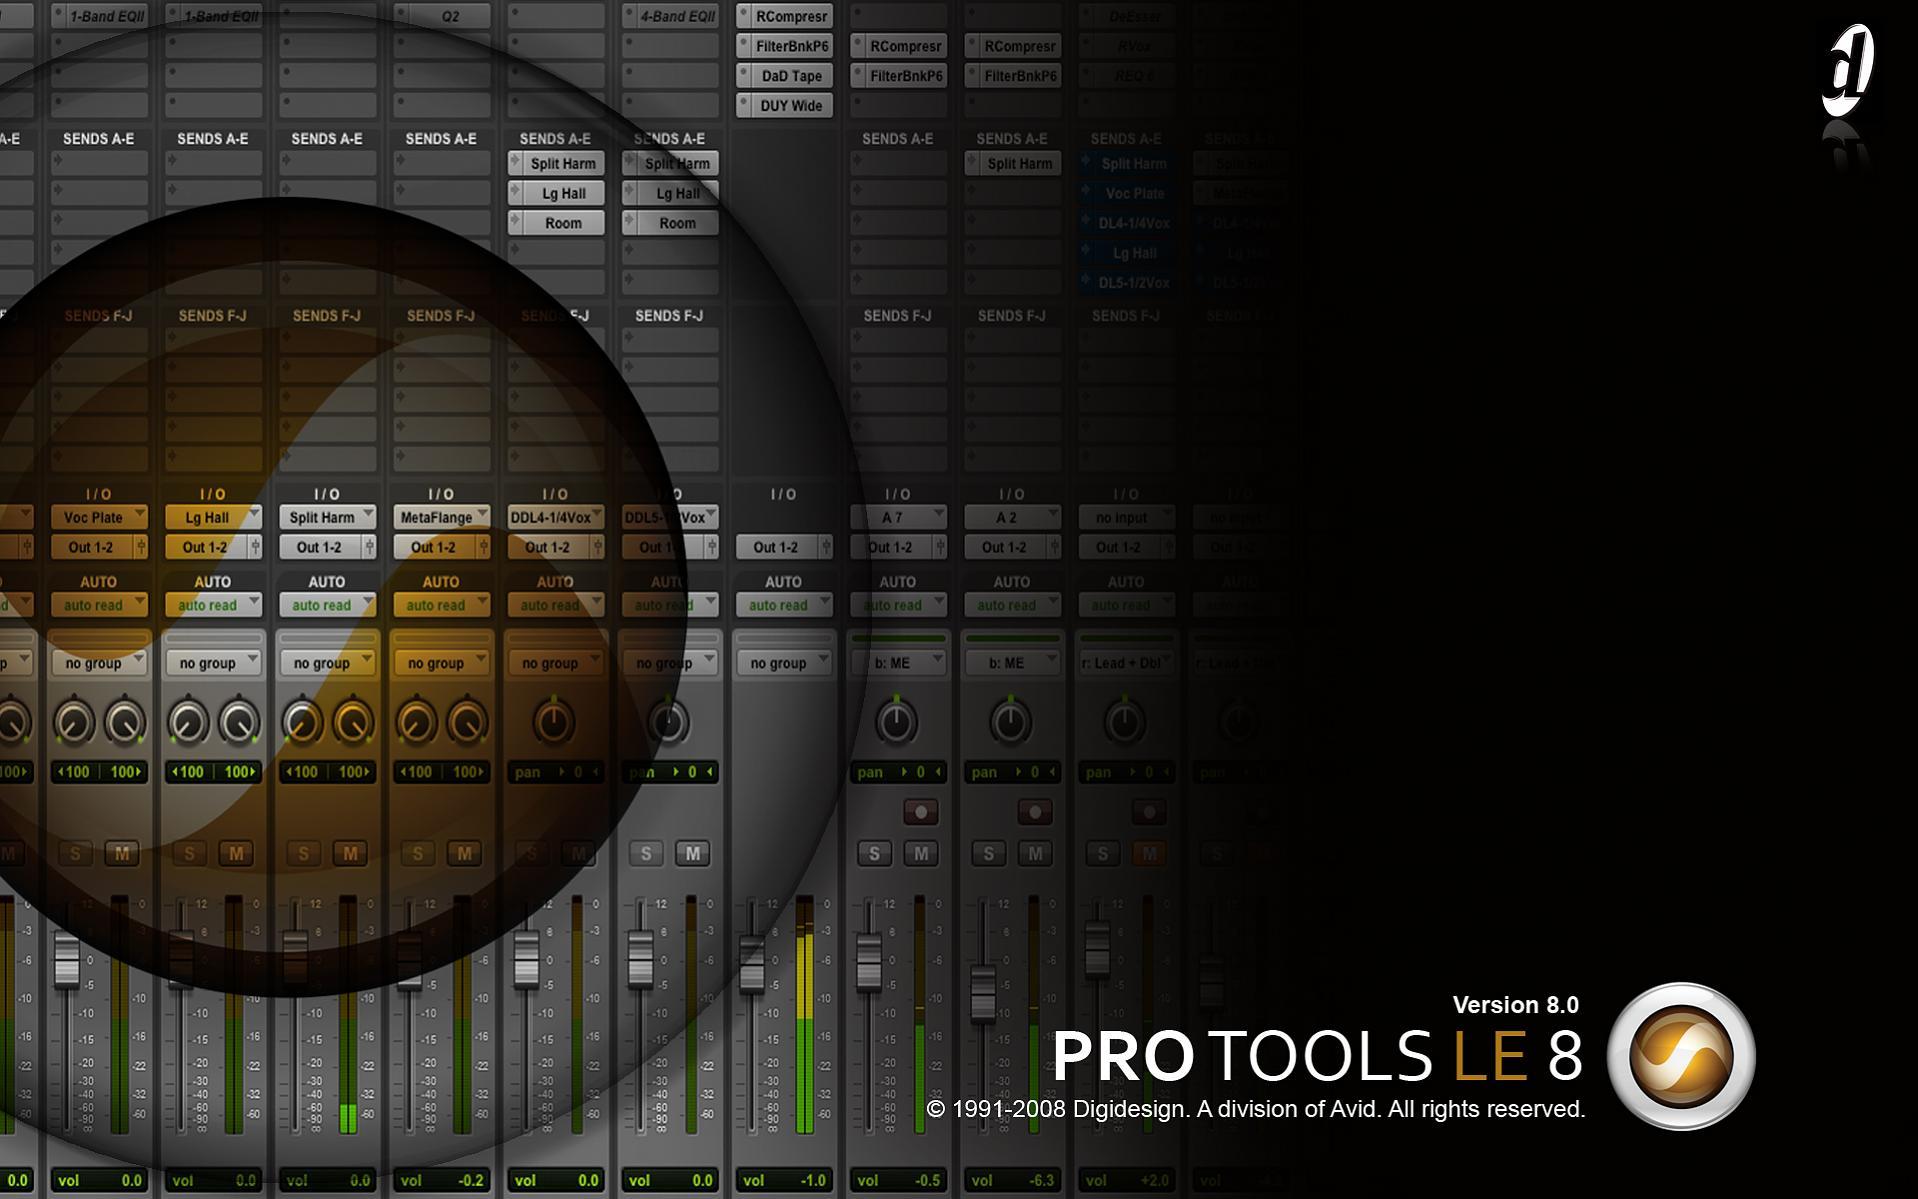 Digidesign pro tools le 7 1 mp toolkit air